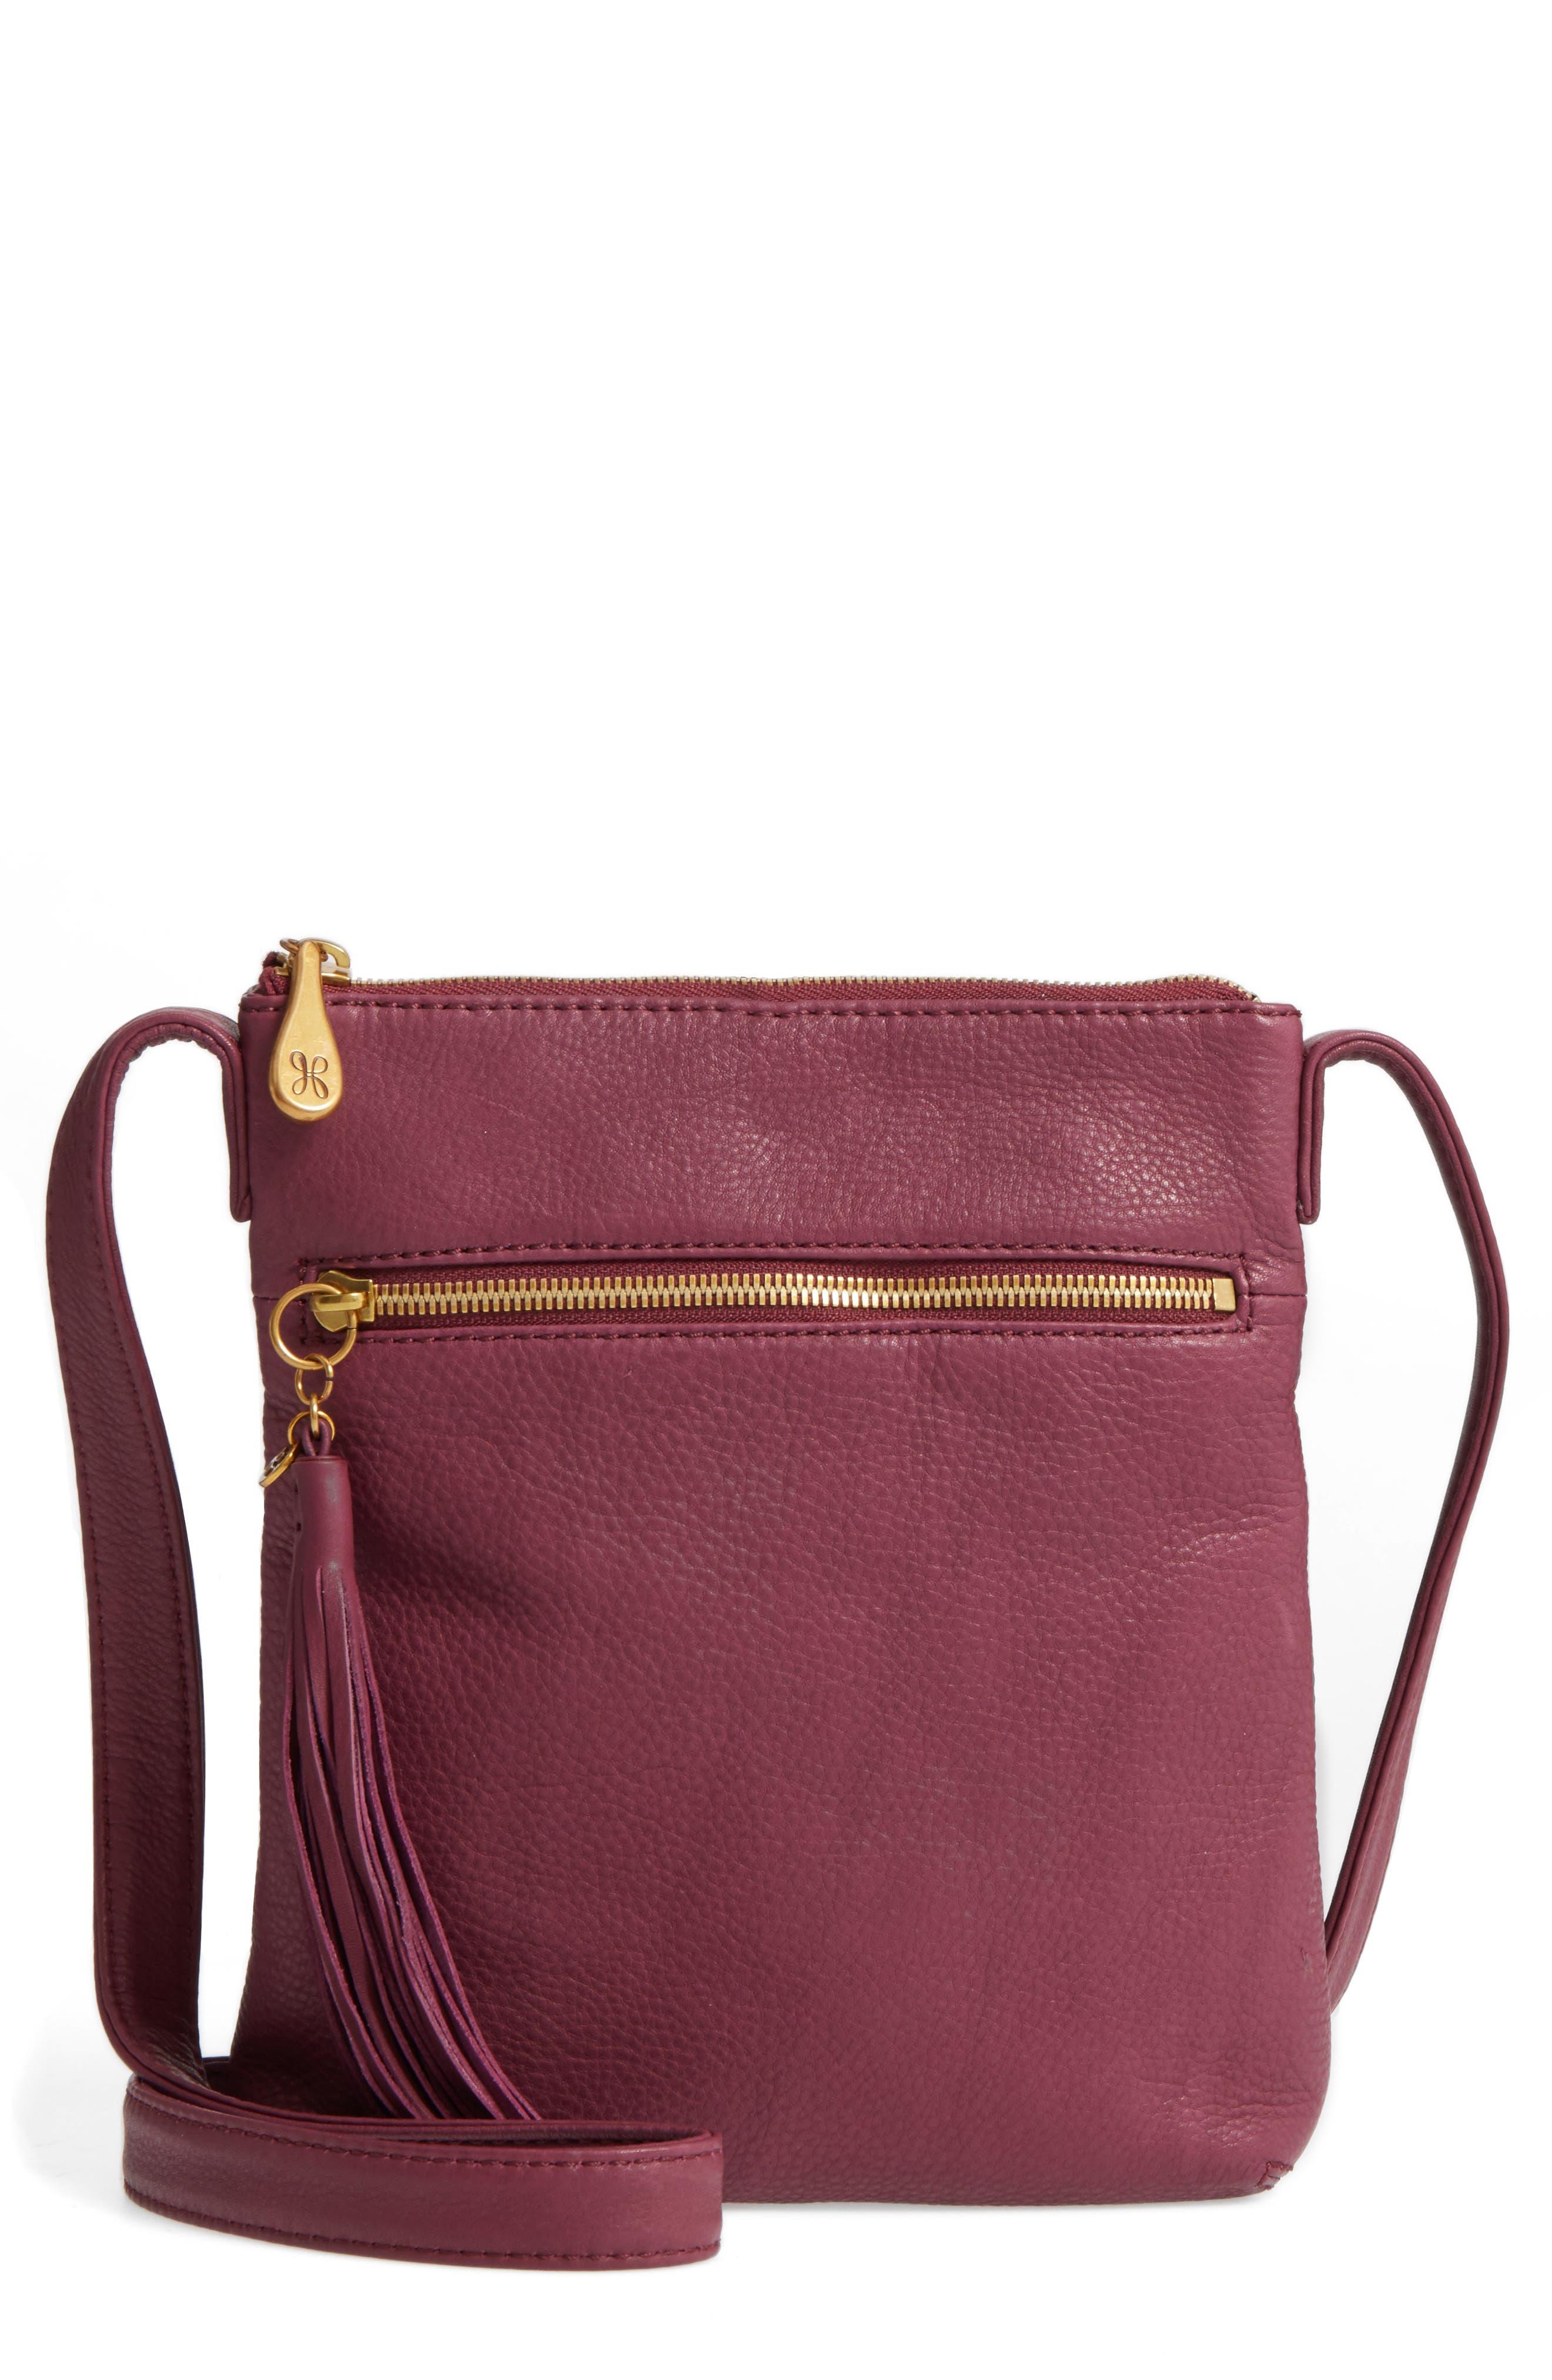 'Sarah' Leather Crossbody Bag,                             Main thumbnail 7, color,